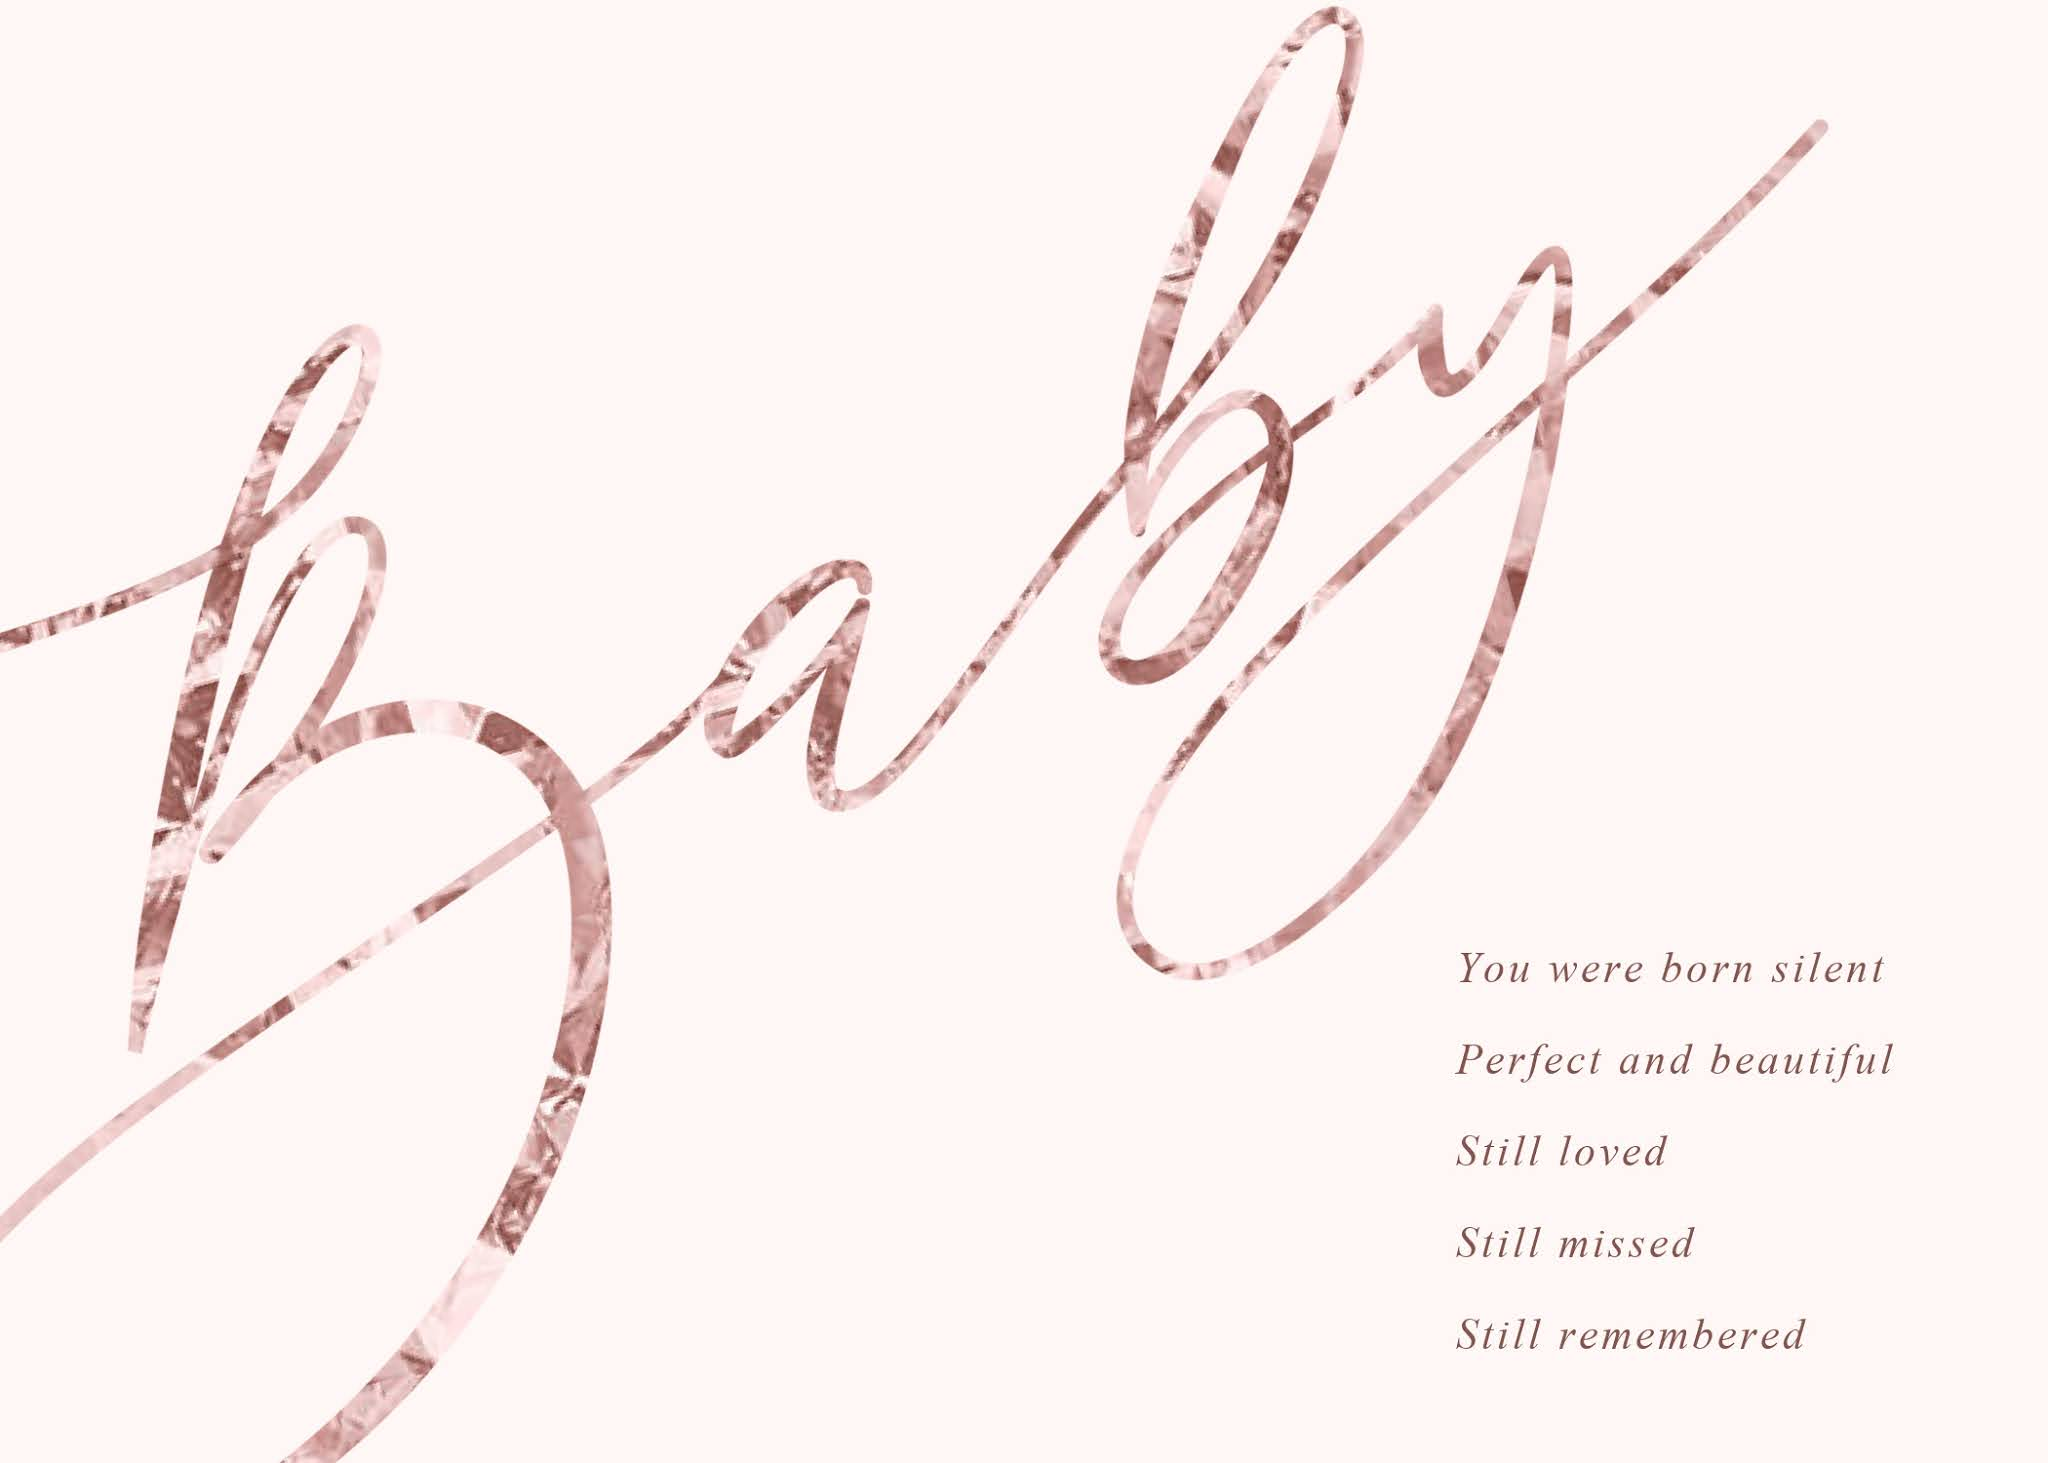 baby stillborn poem